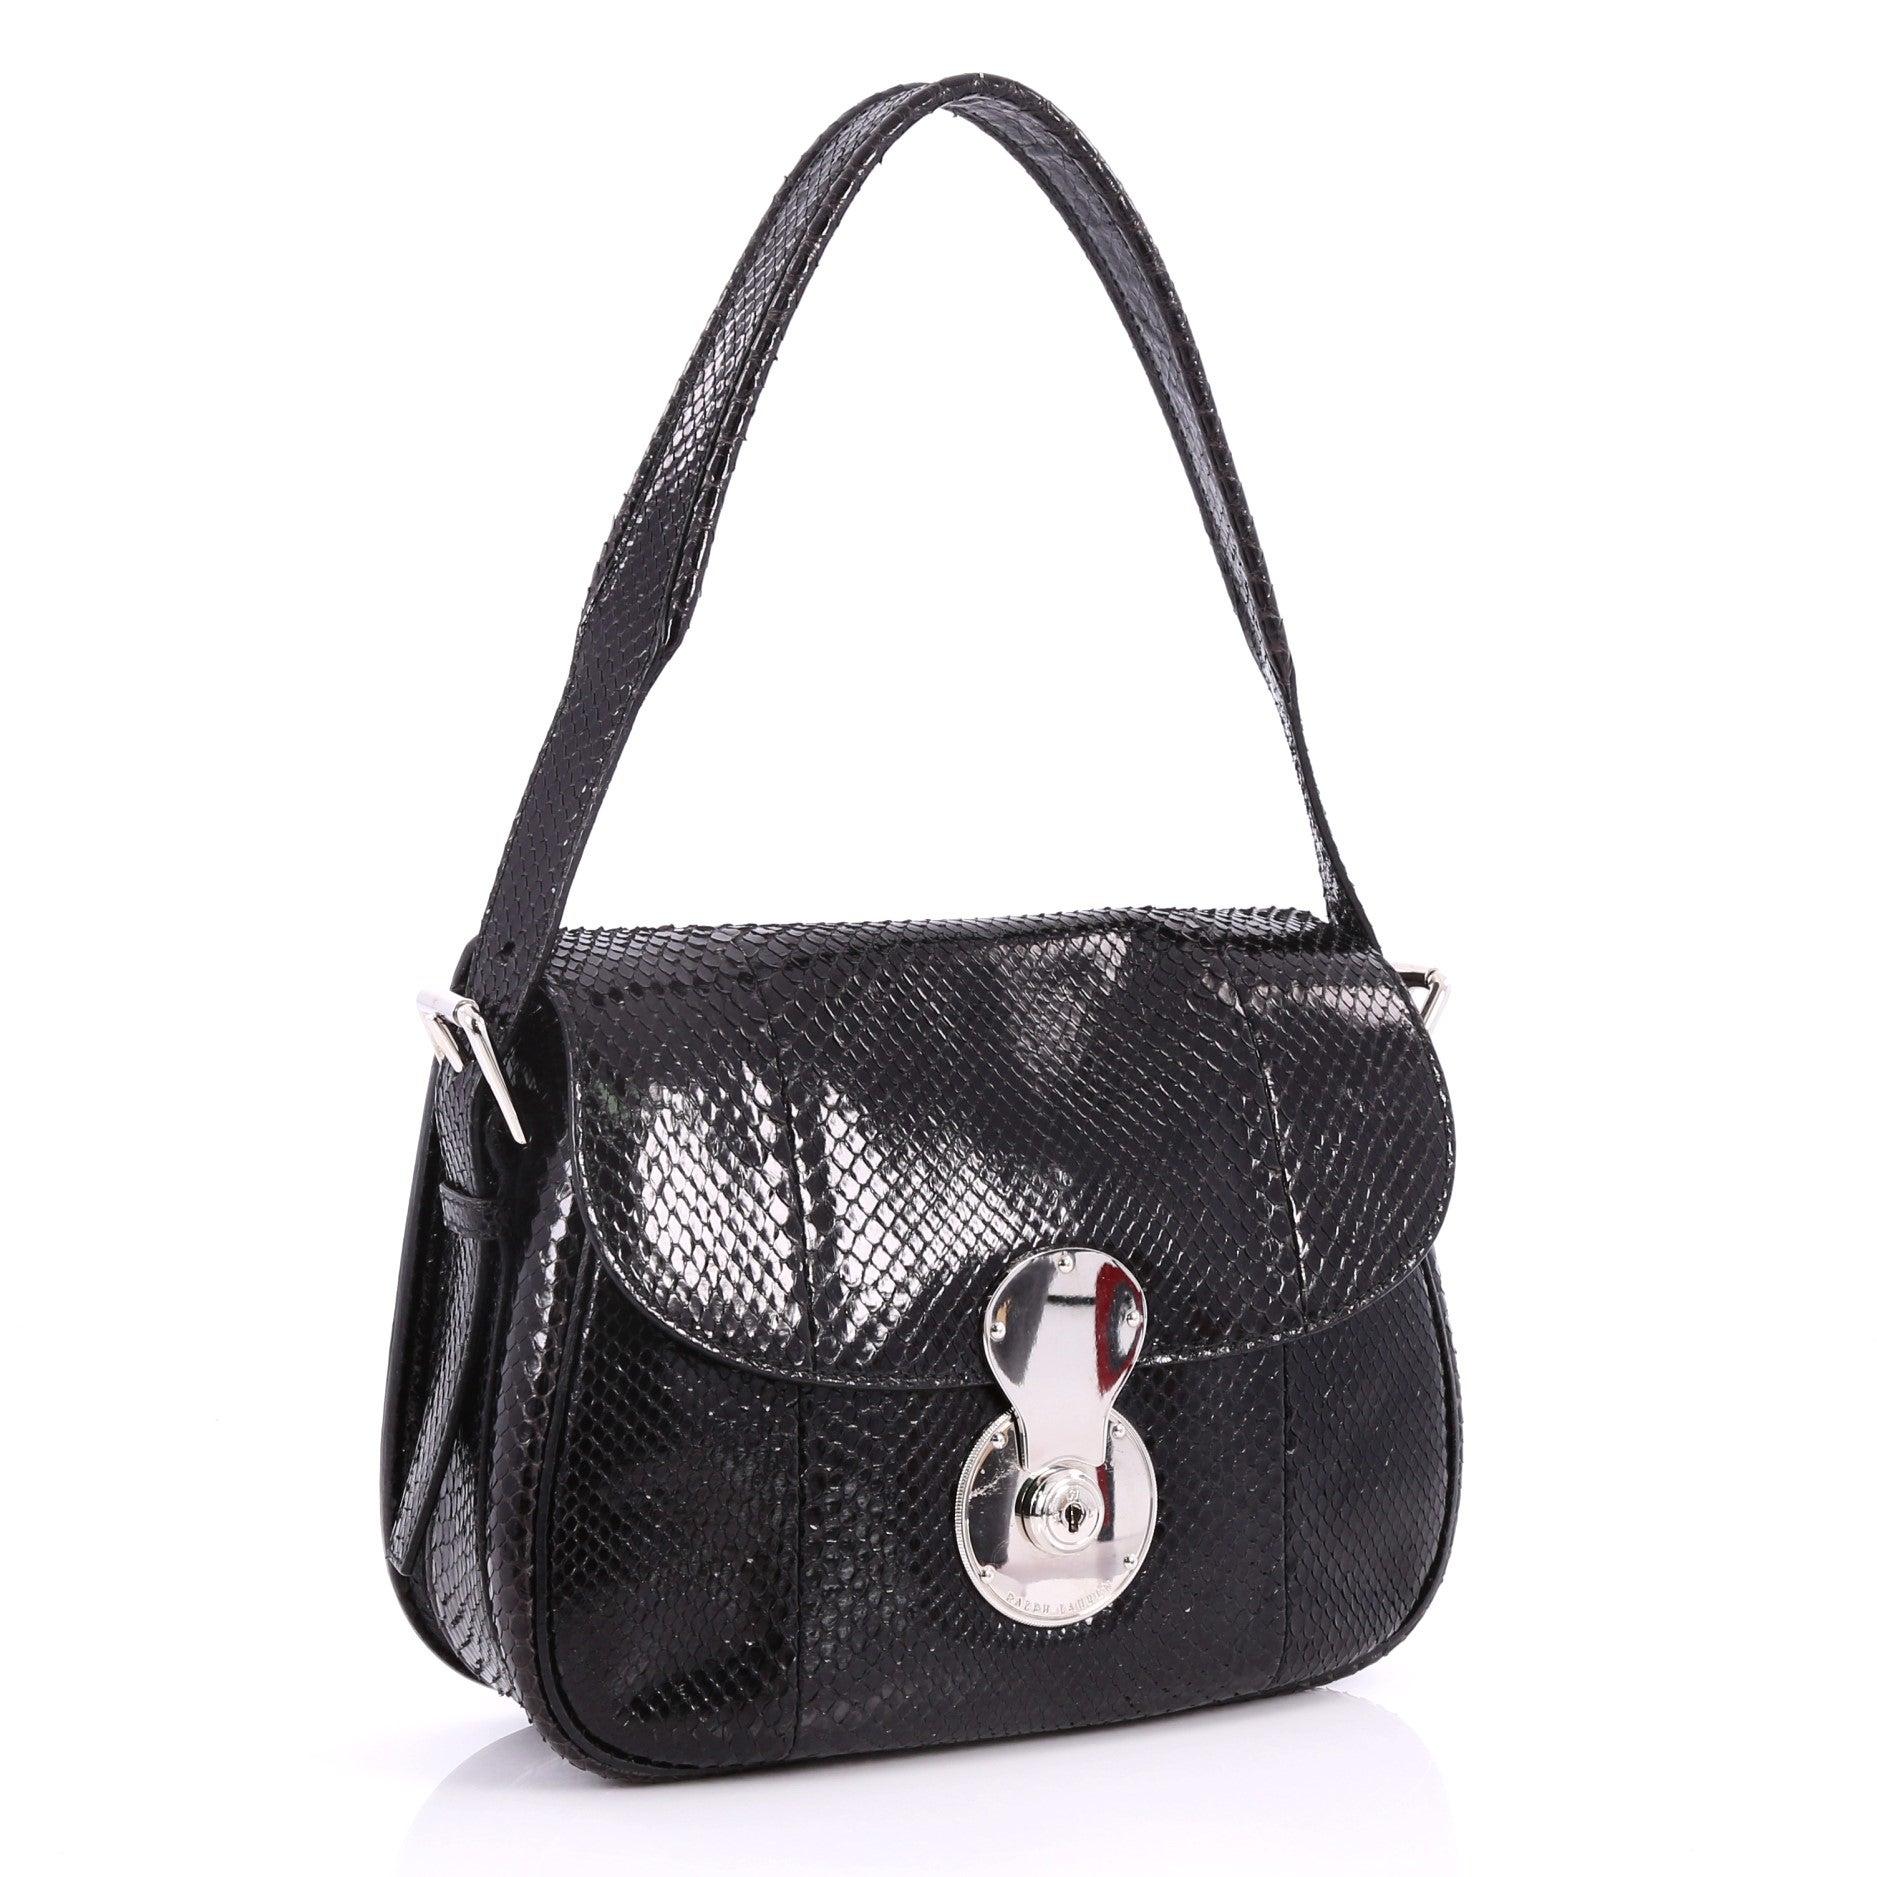 Ralph Lauren Collection Ricky Convertible Flap Bag Python Medium at 1stdibs dd926d5c21